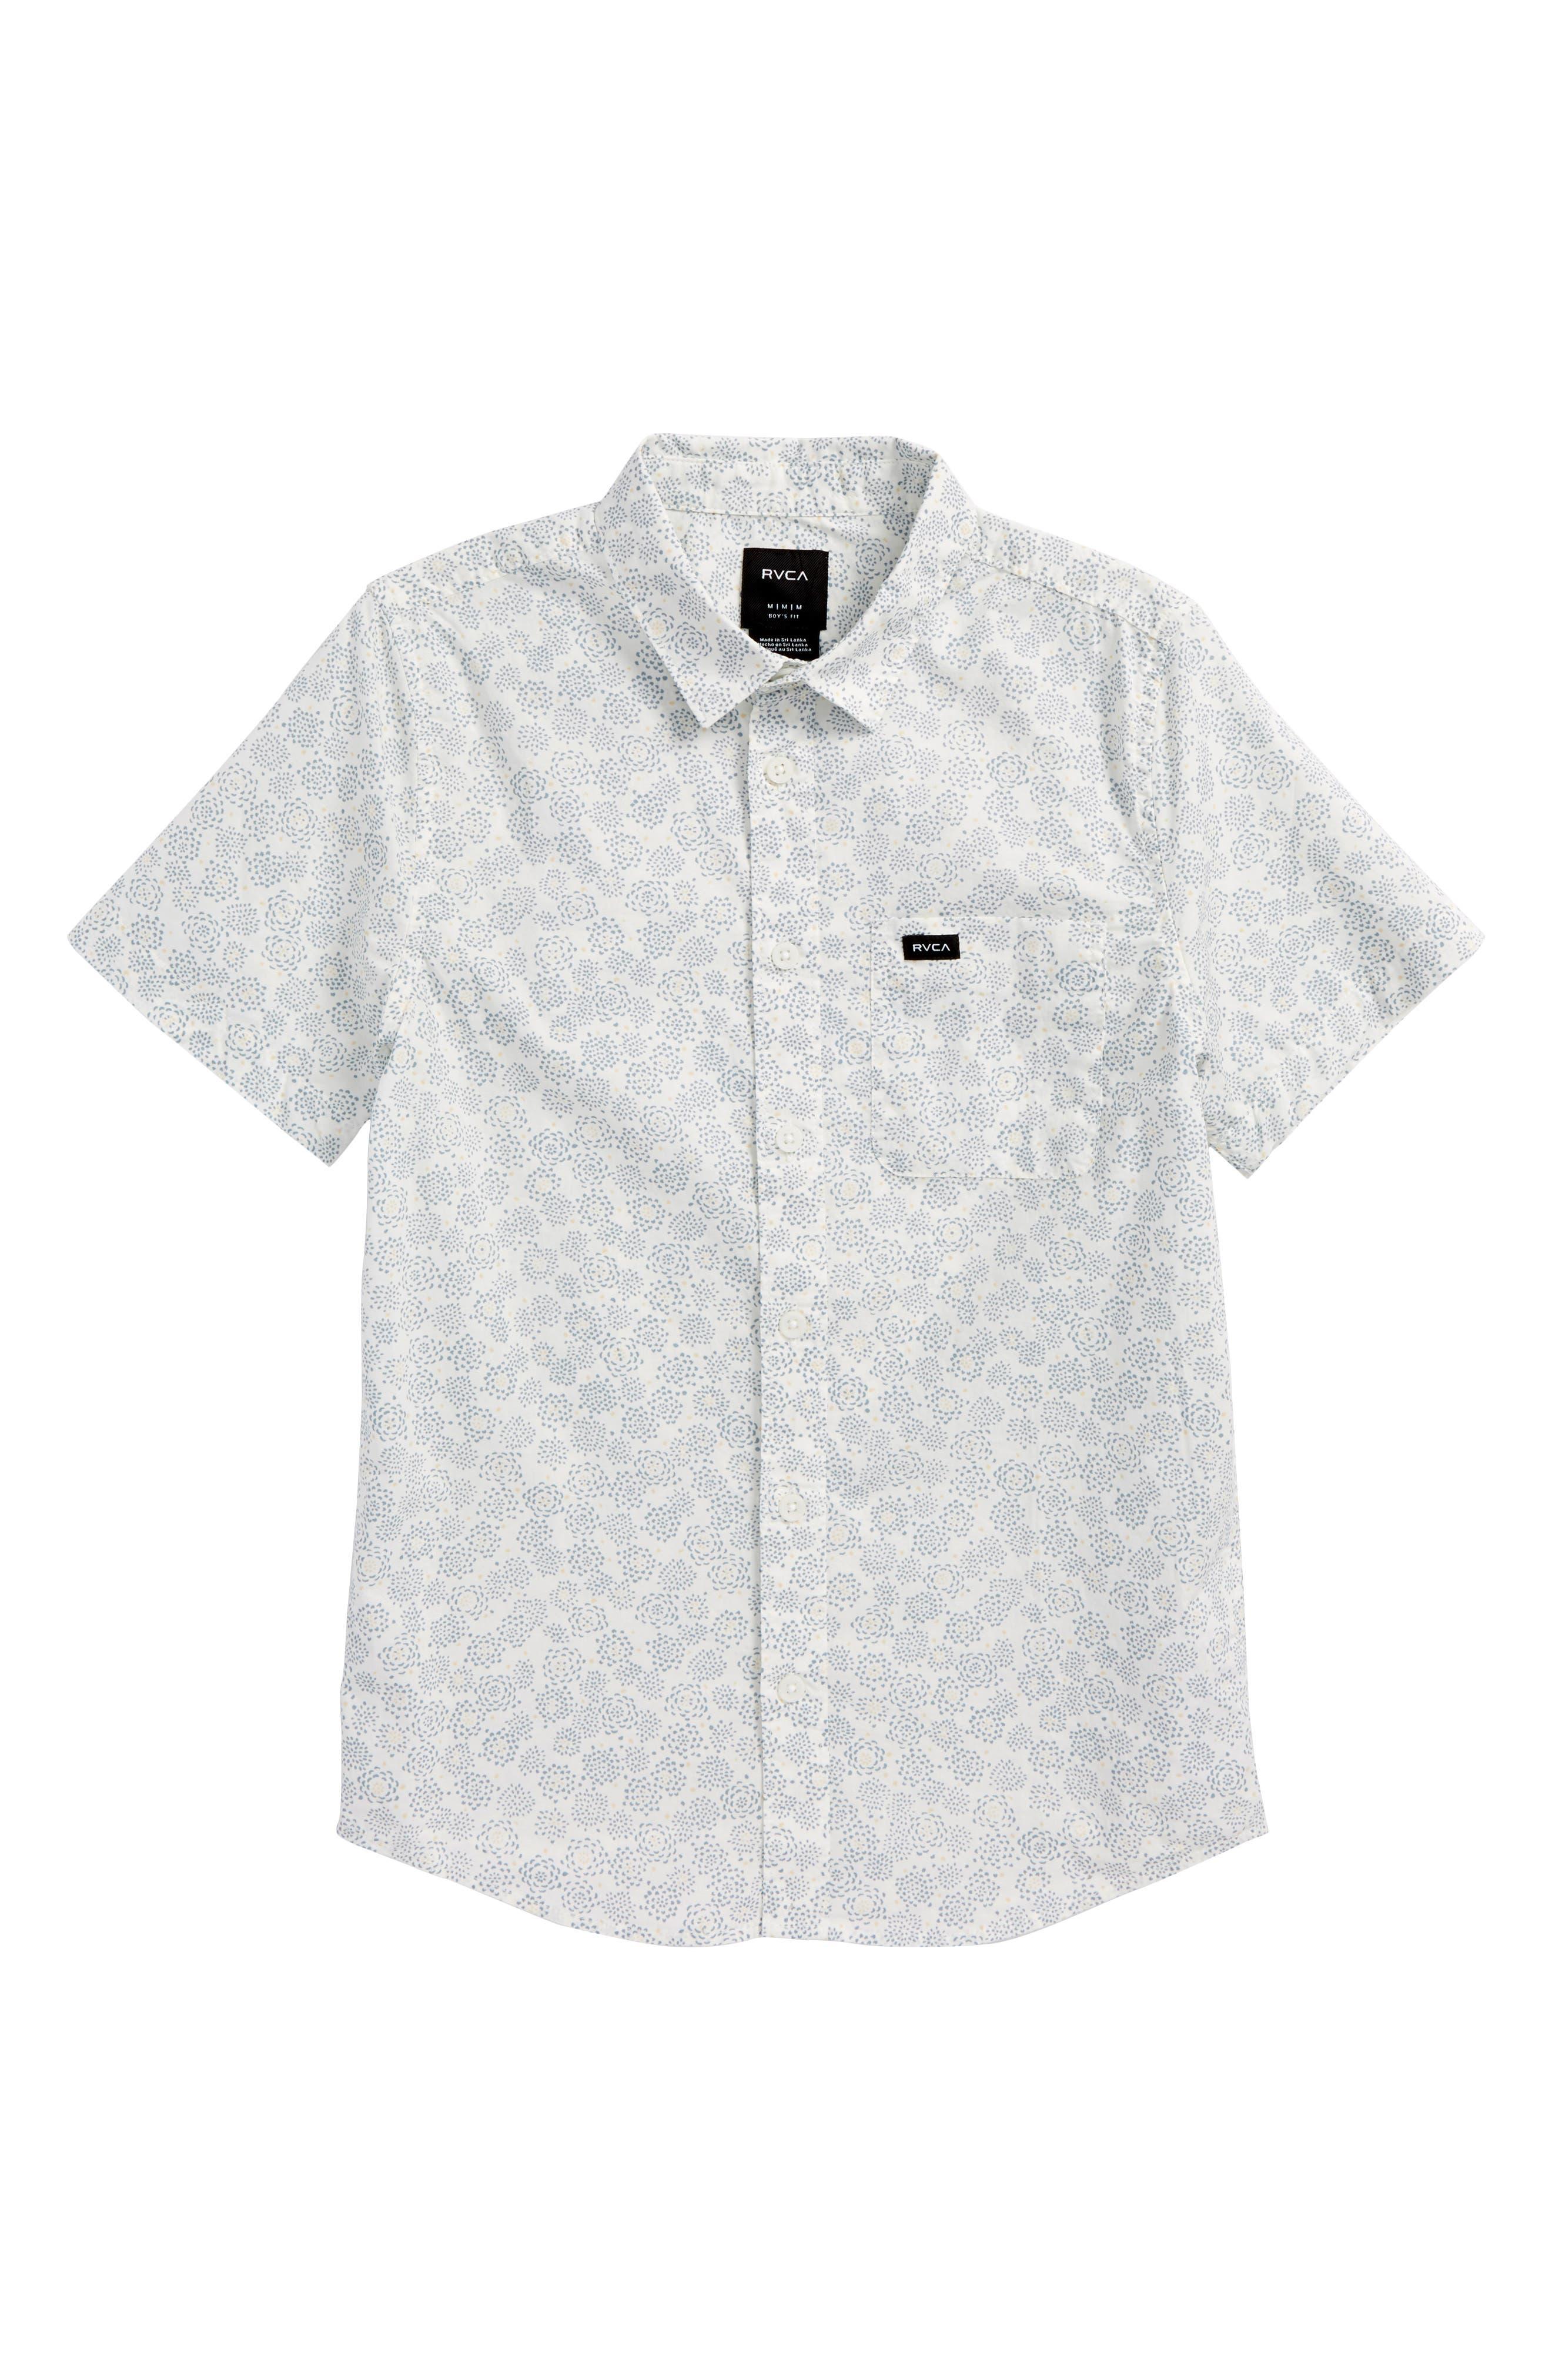 Alternate Image 1 Selected - RVCA Cleta Woven Shirt (Big Boys)